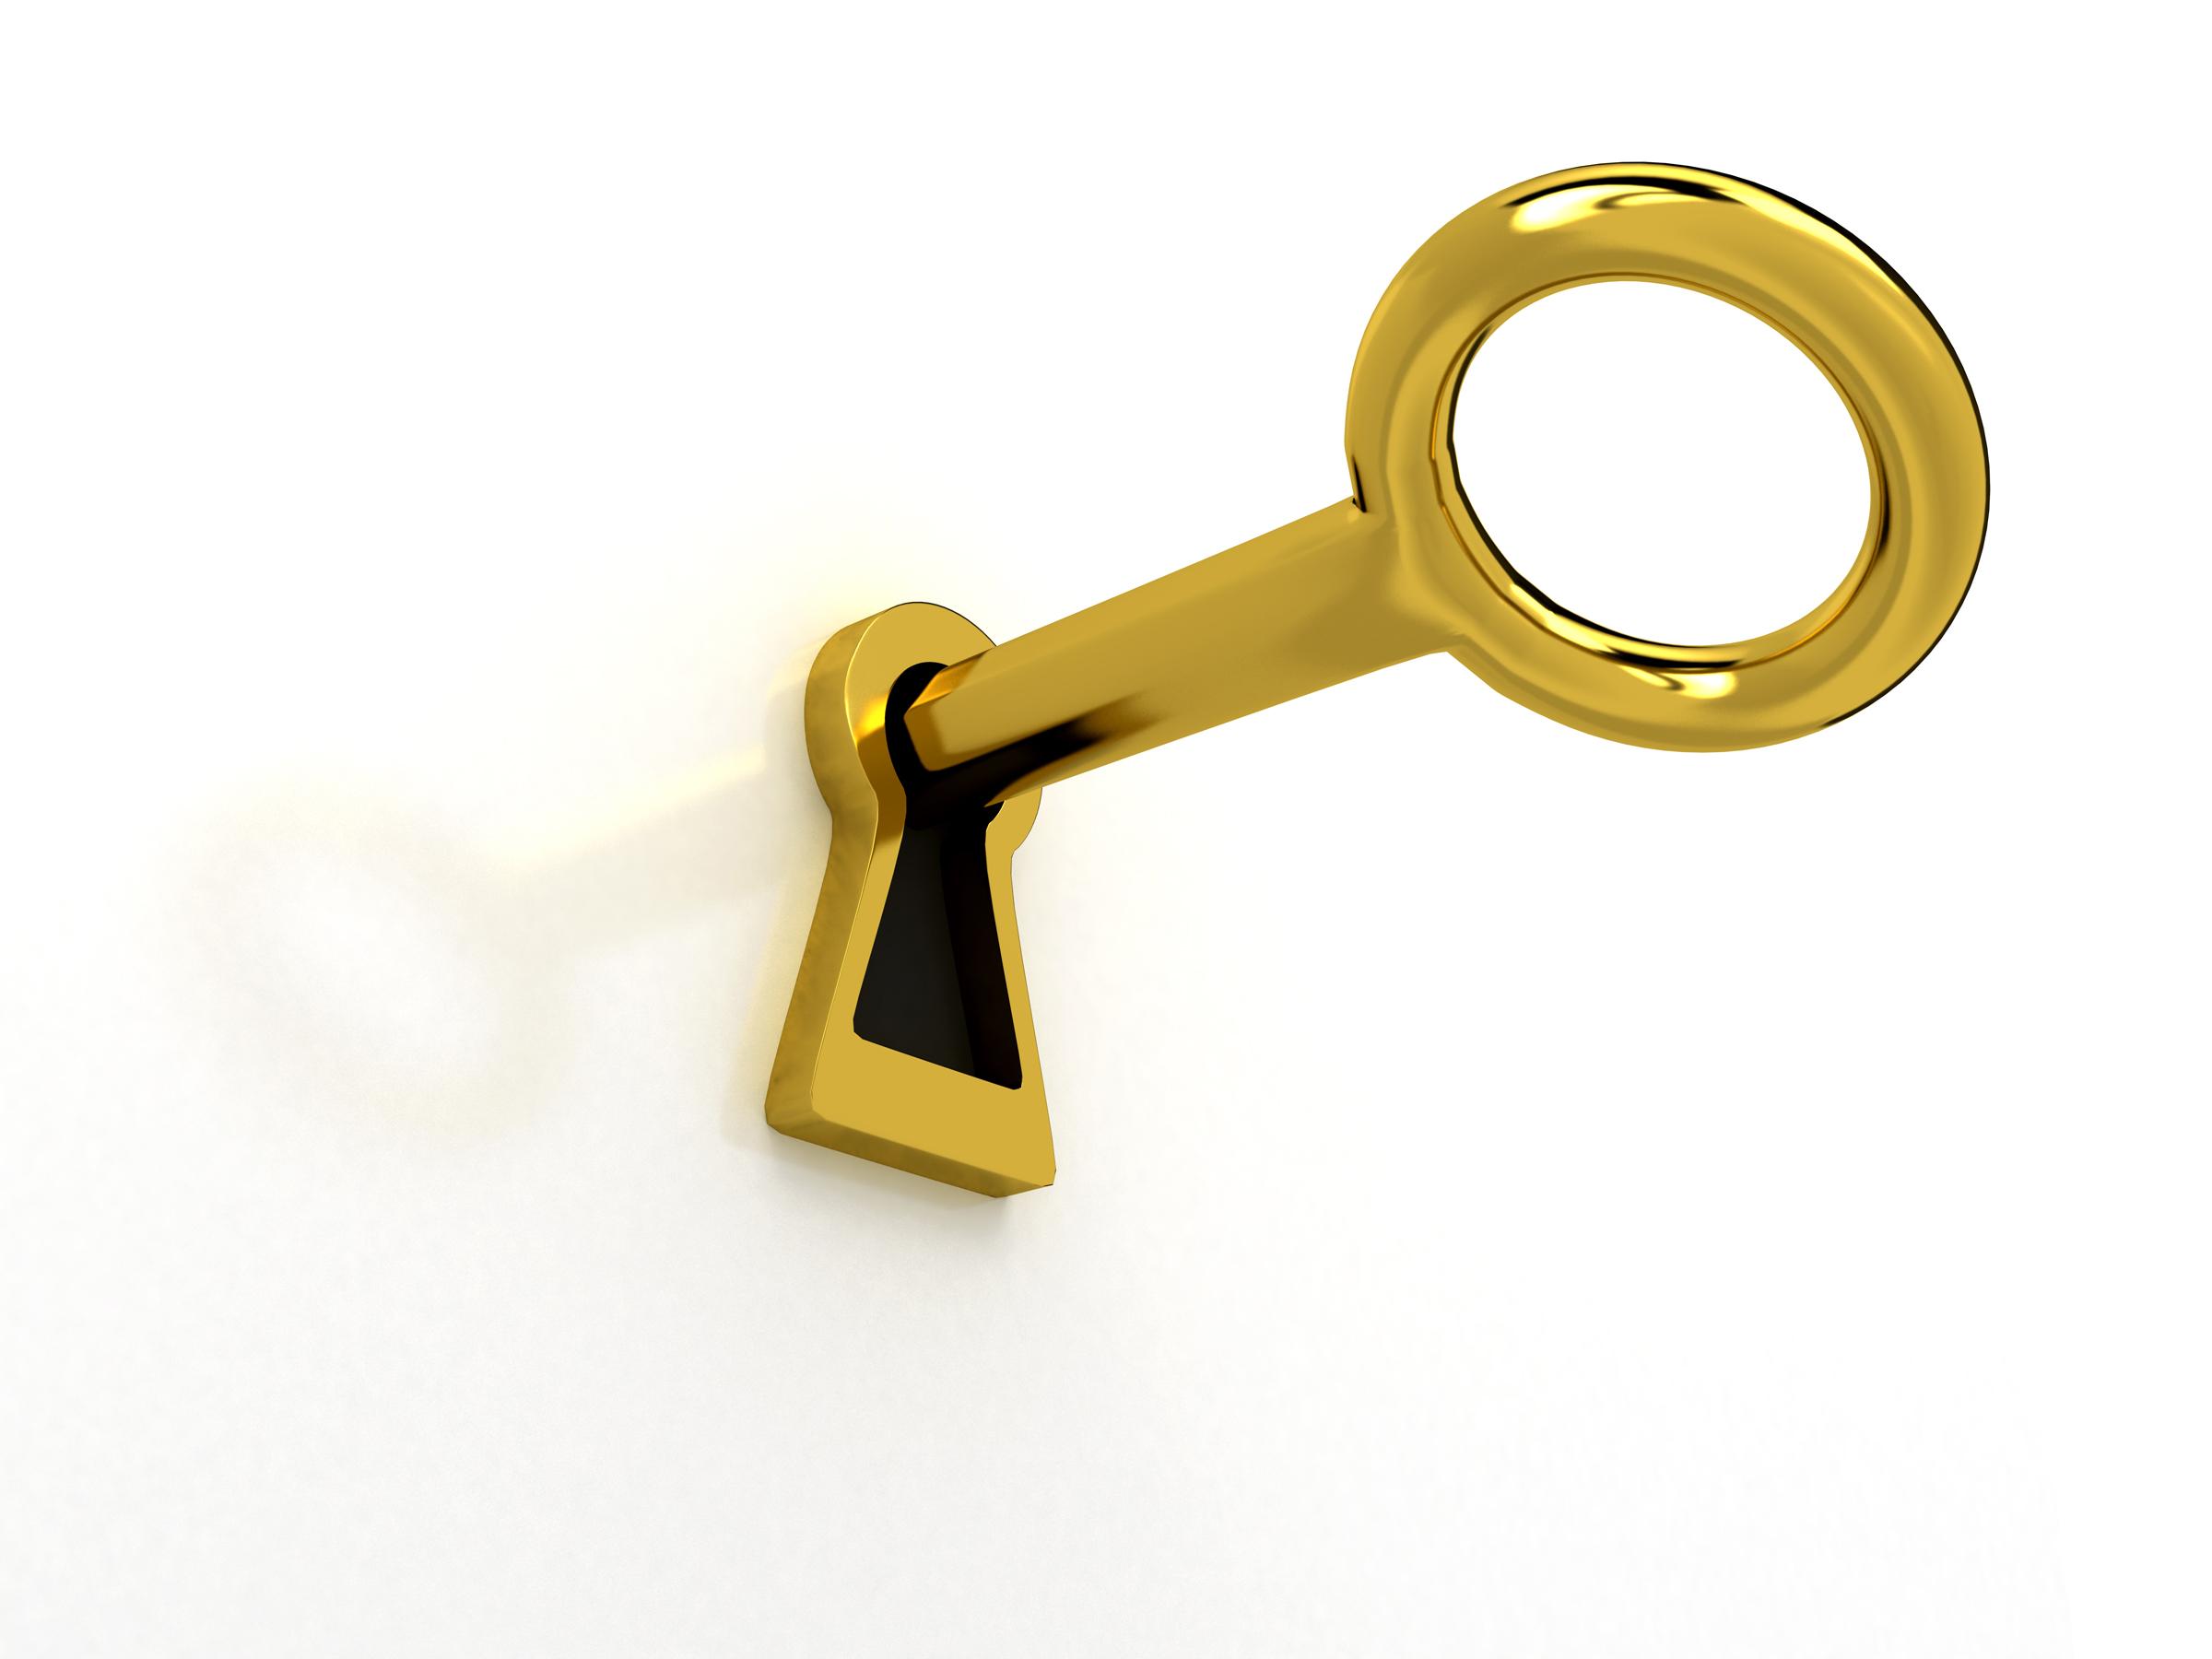 padlock and key clipart - photo #18